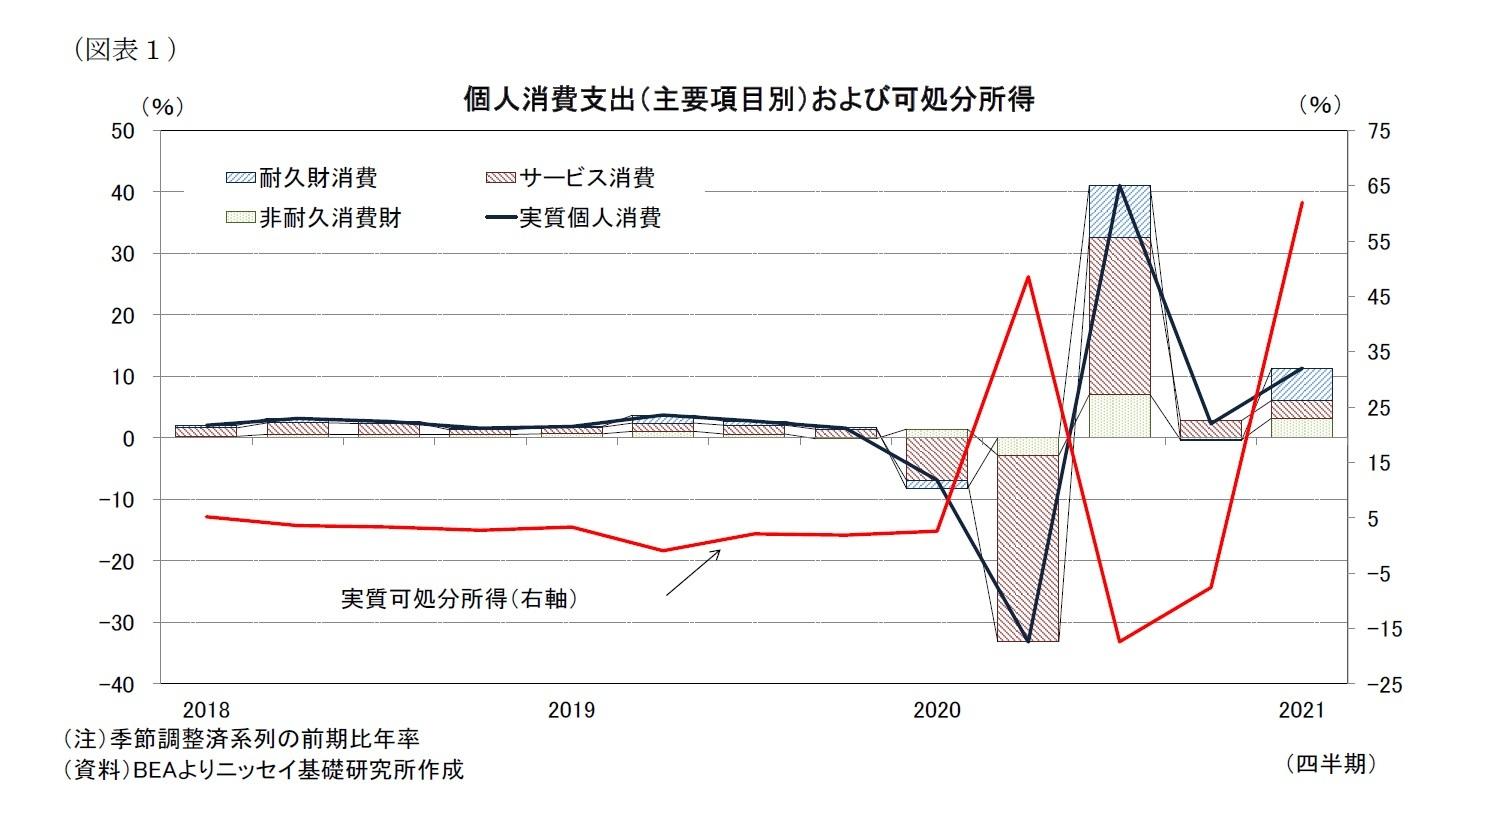 (図表1)個人消費支出(主要項目別)および可処分所得